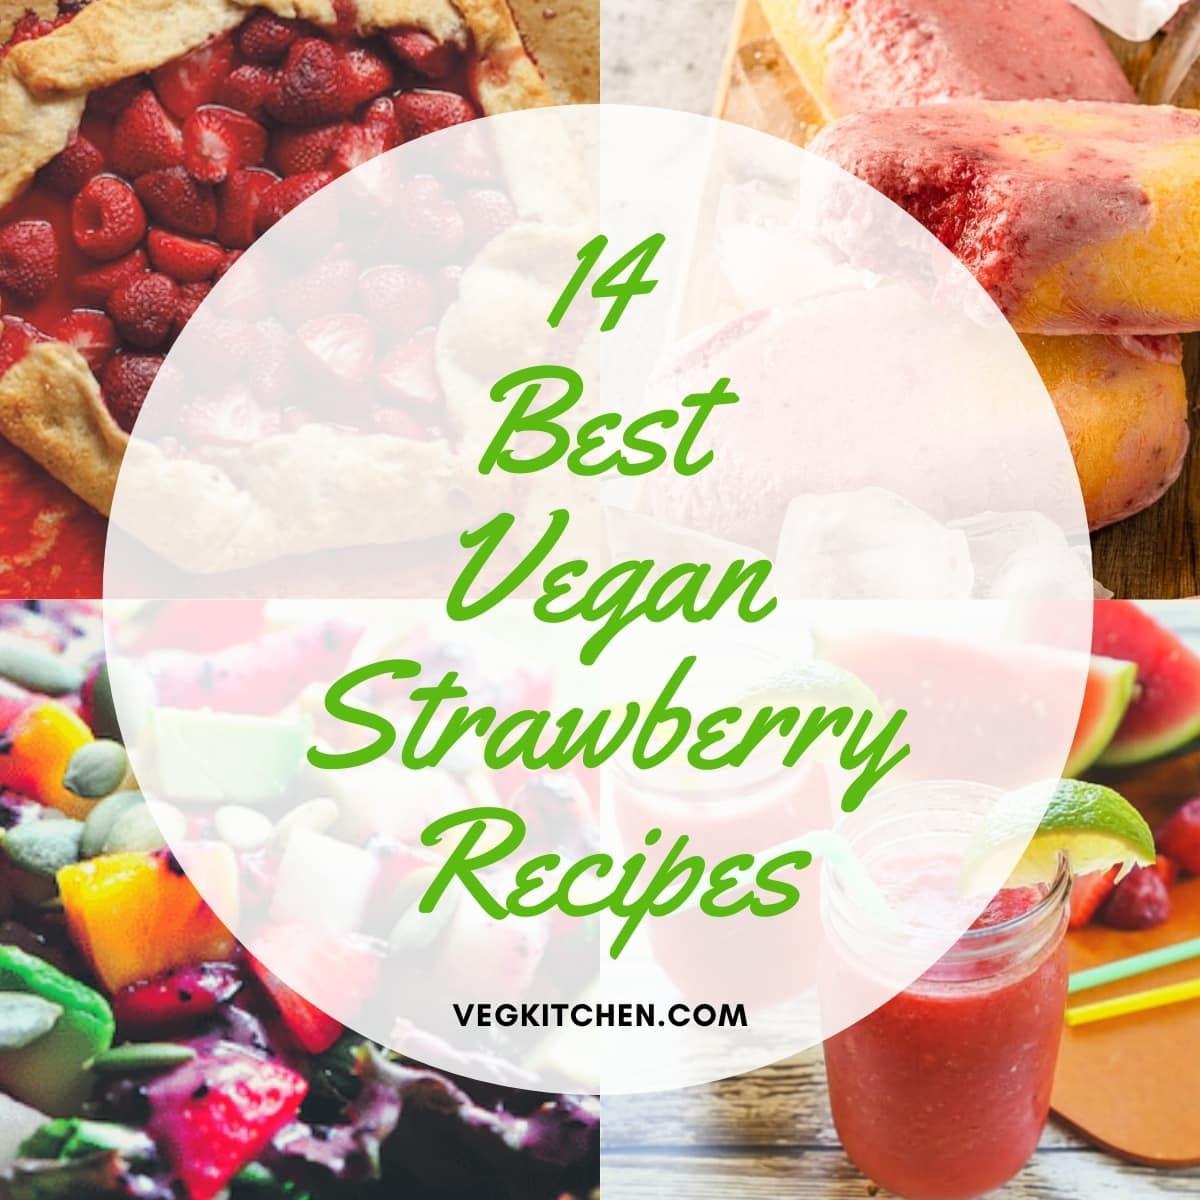 vegan friendly strawberry recipes